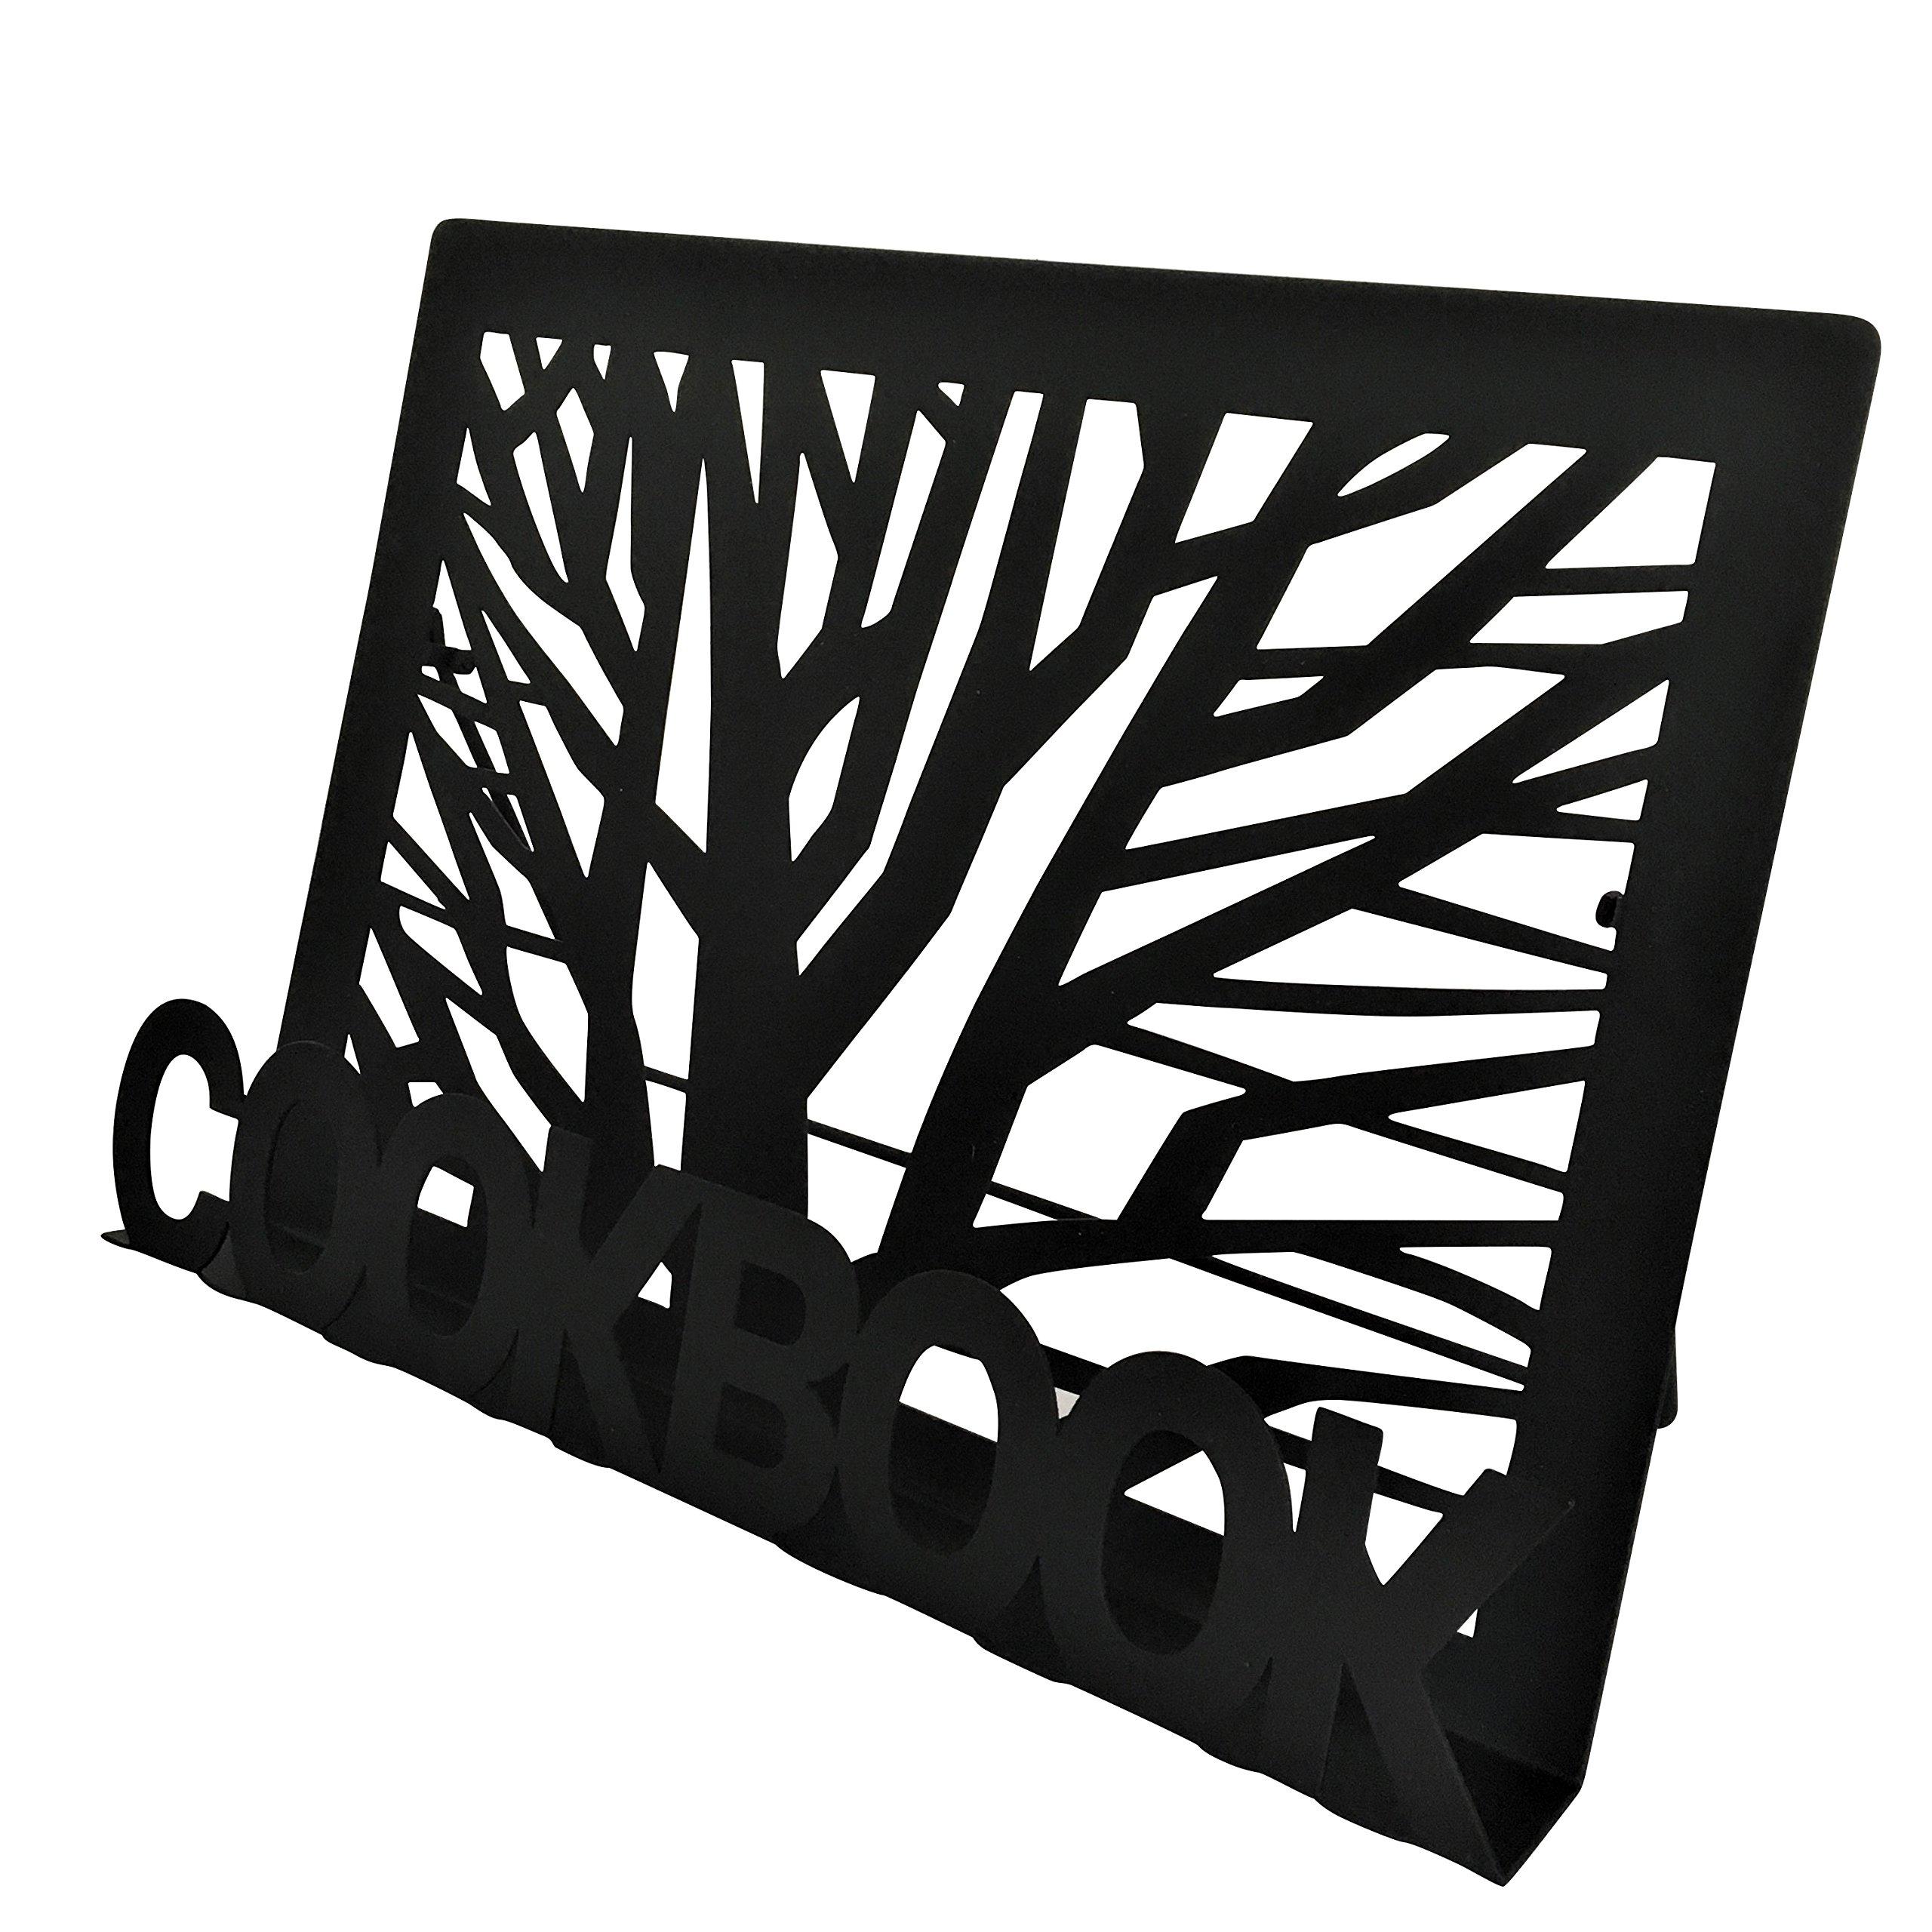 Cookbook Holder Recipe Book Stand - Black Metal - Tree design